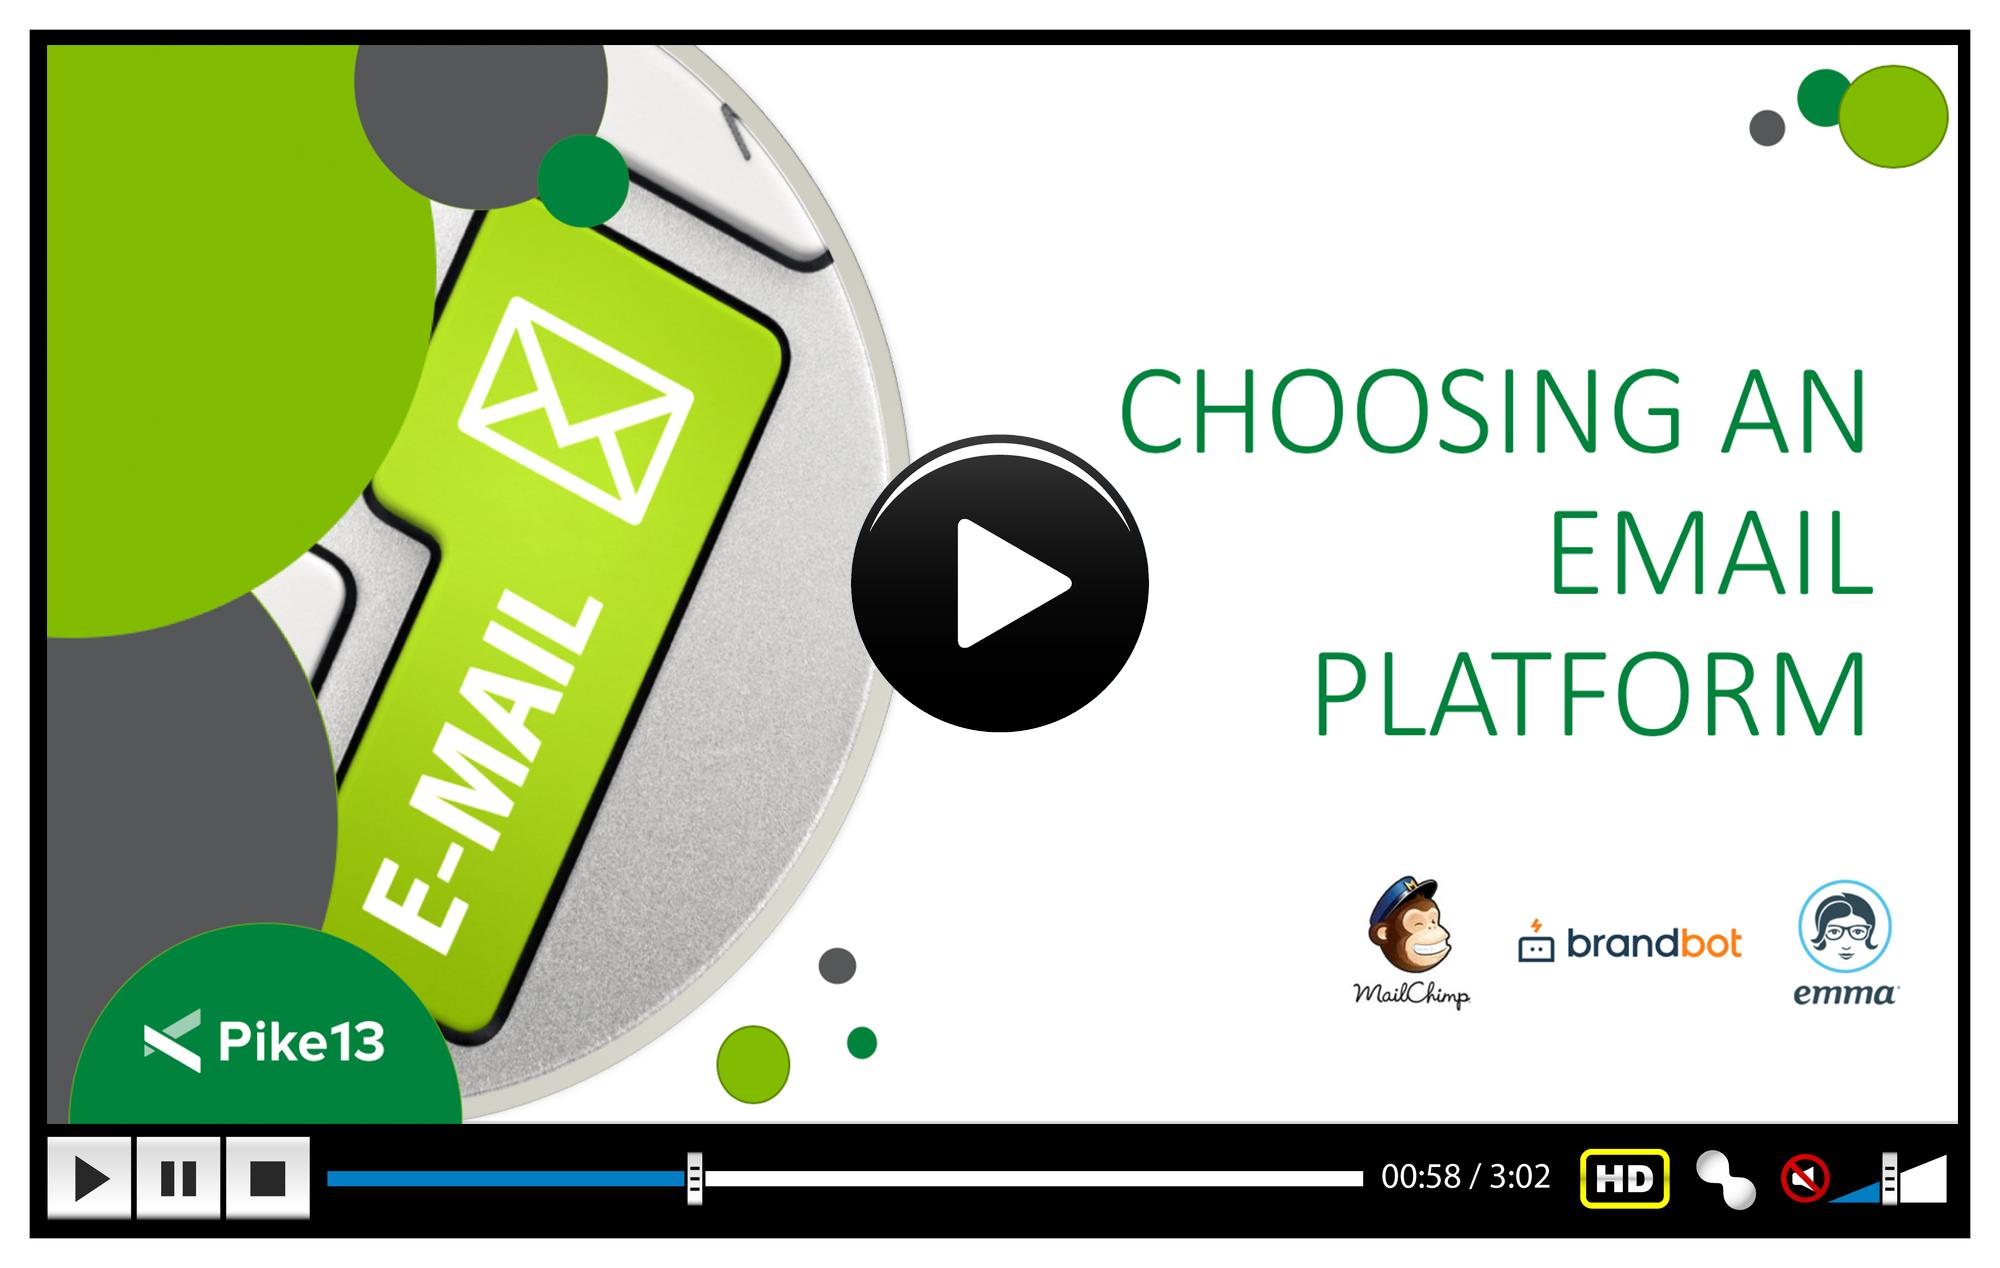 webinar-graphic-choosing-email-platform.png